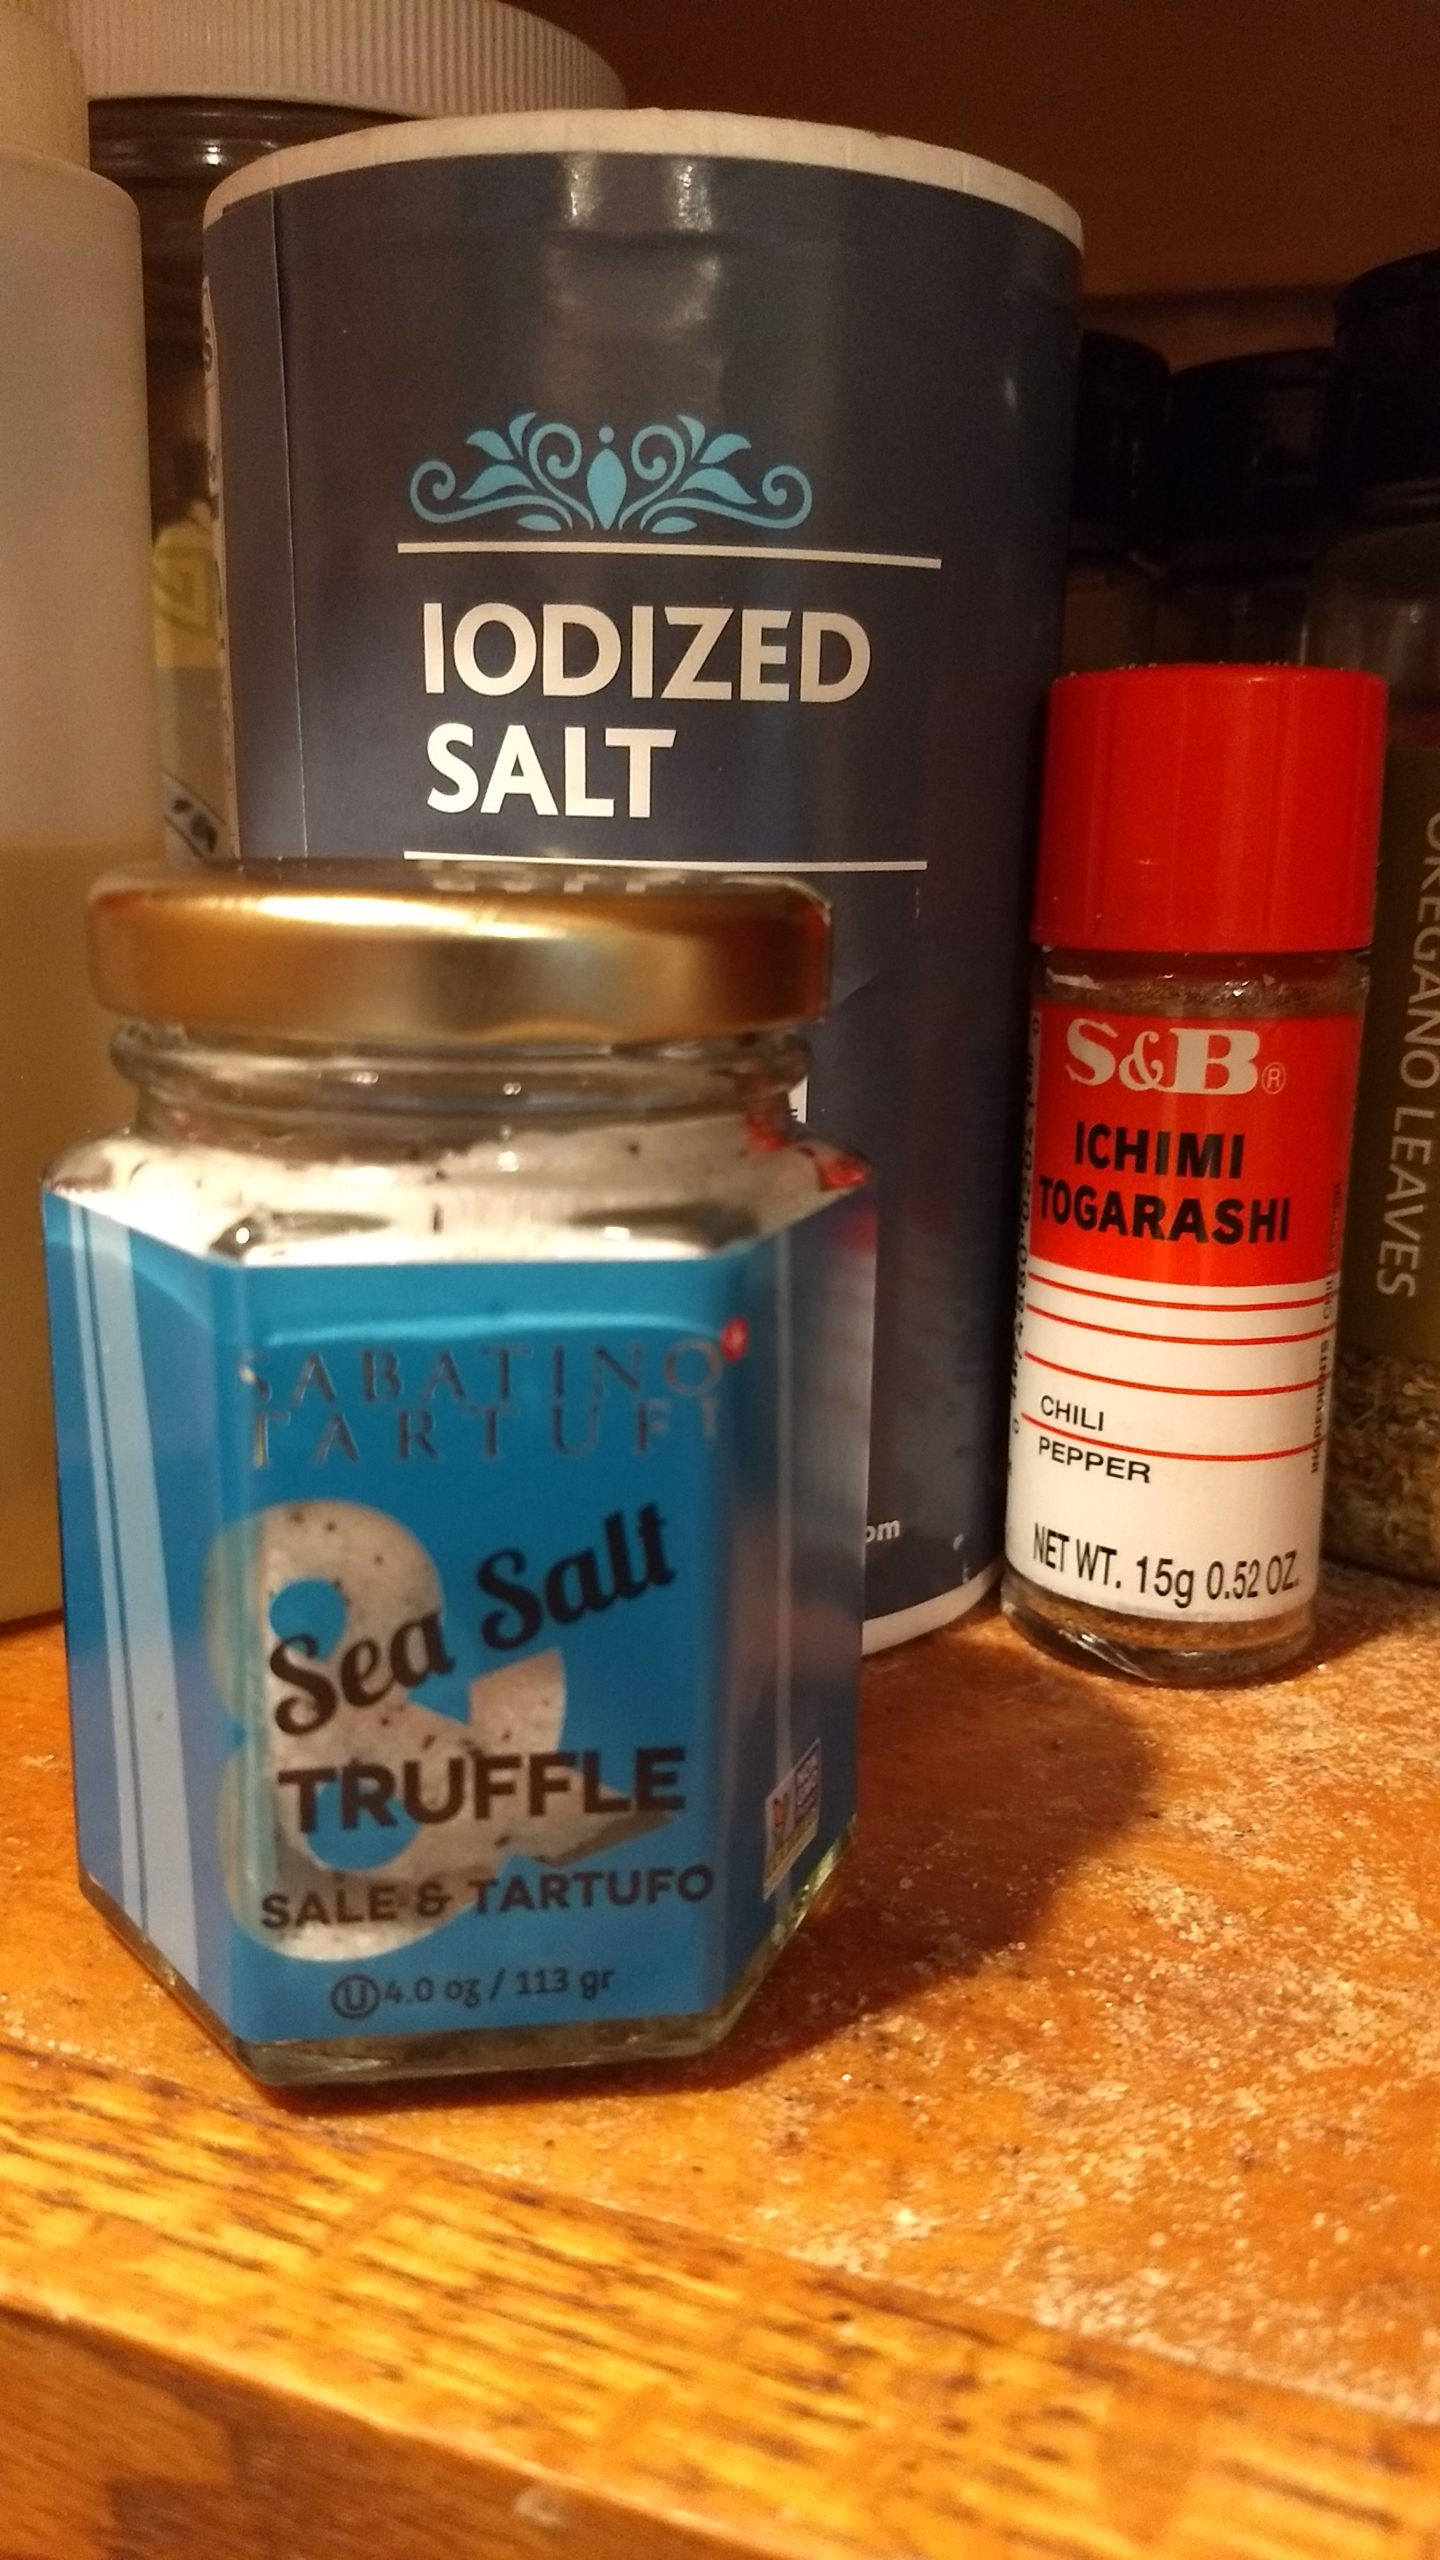 Sabatino-truffle-salt